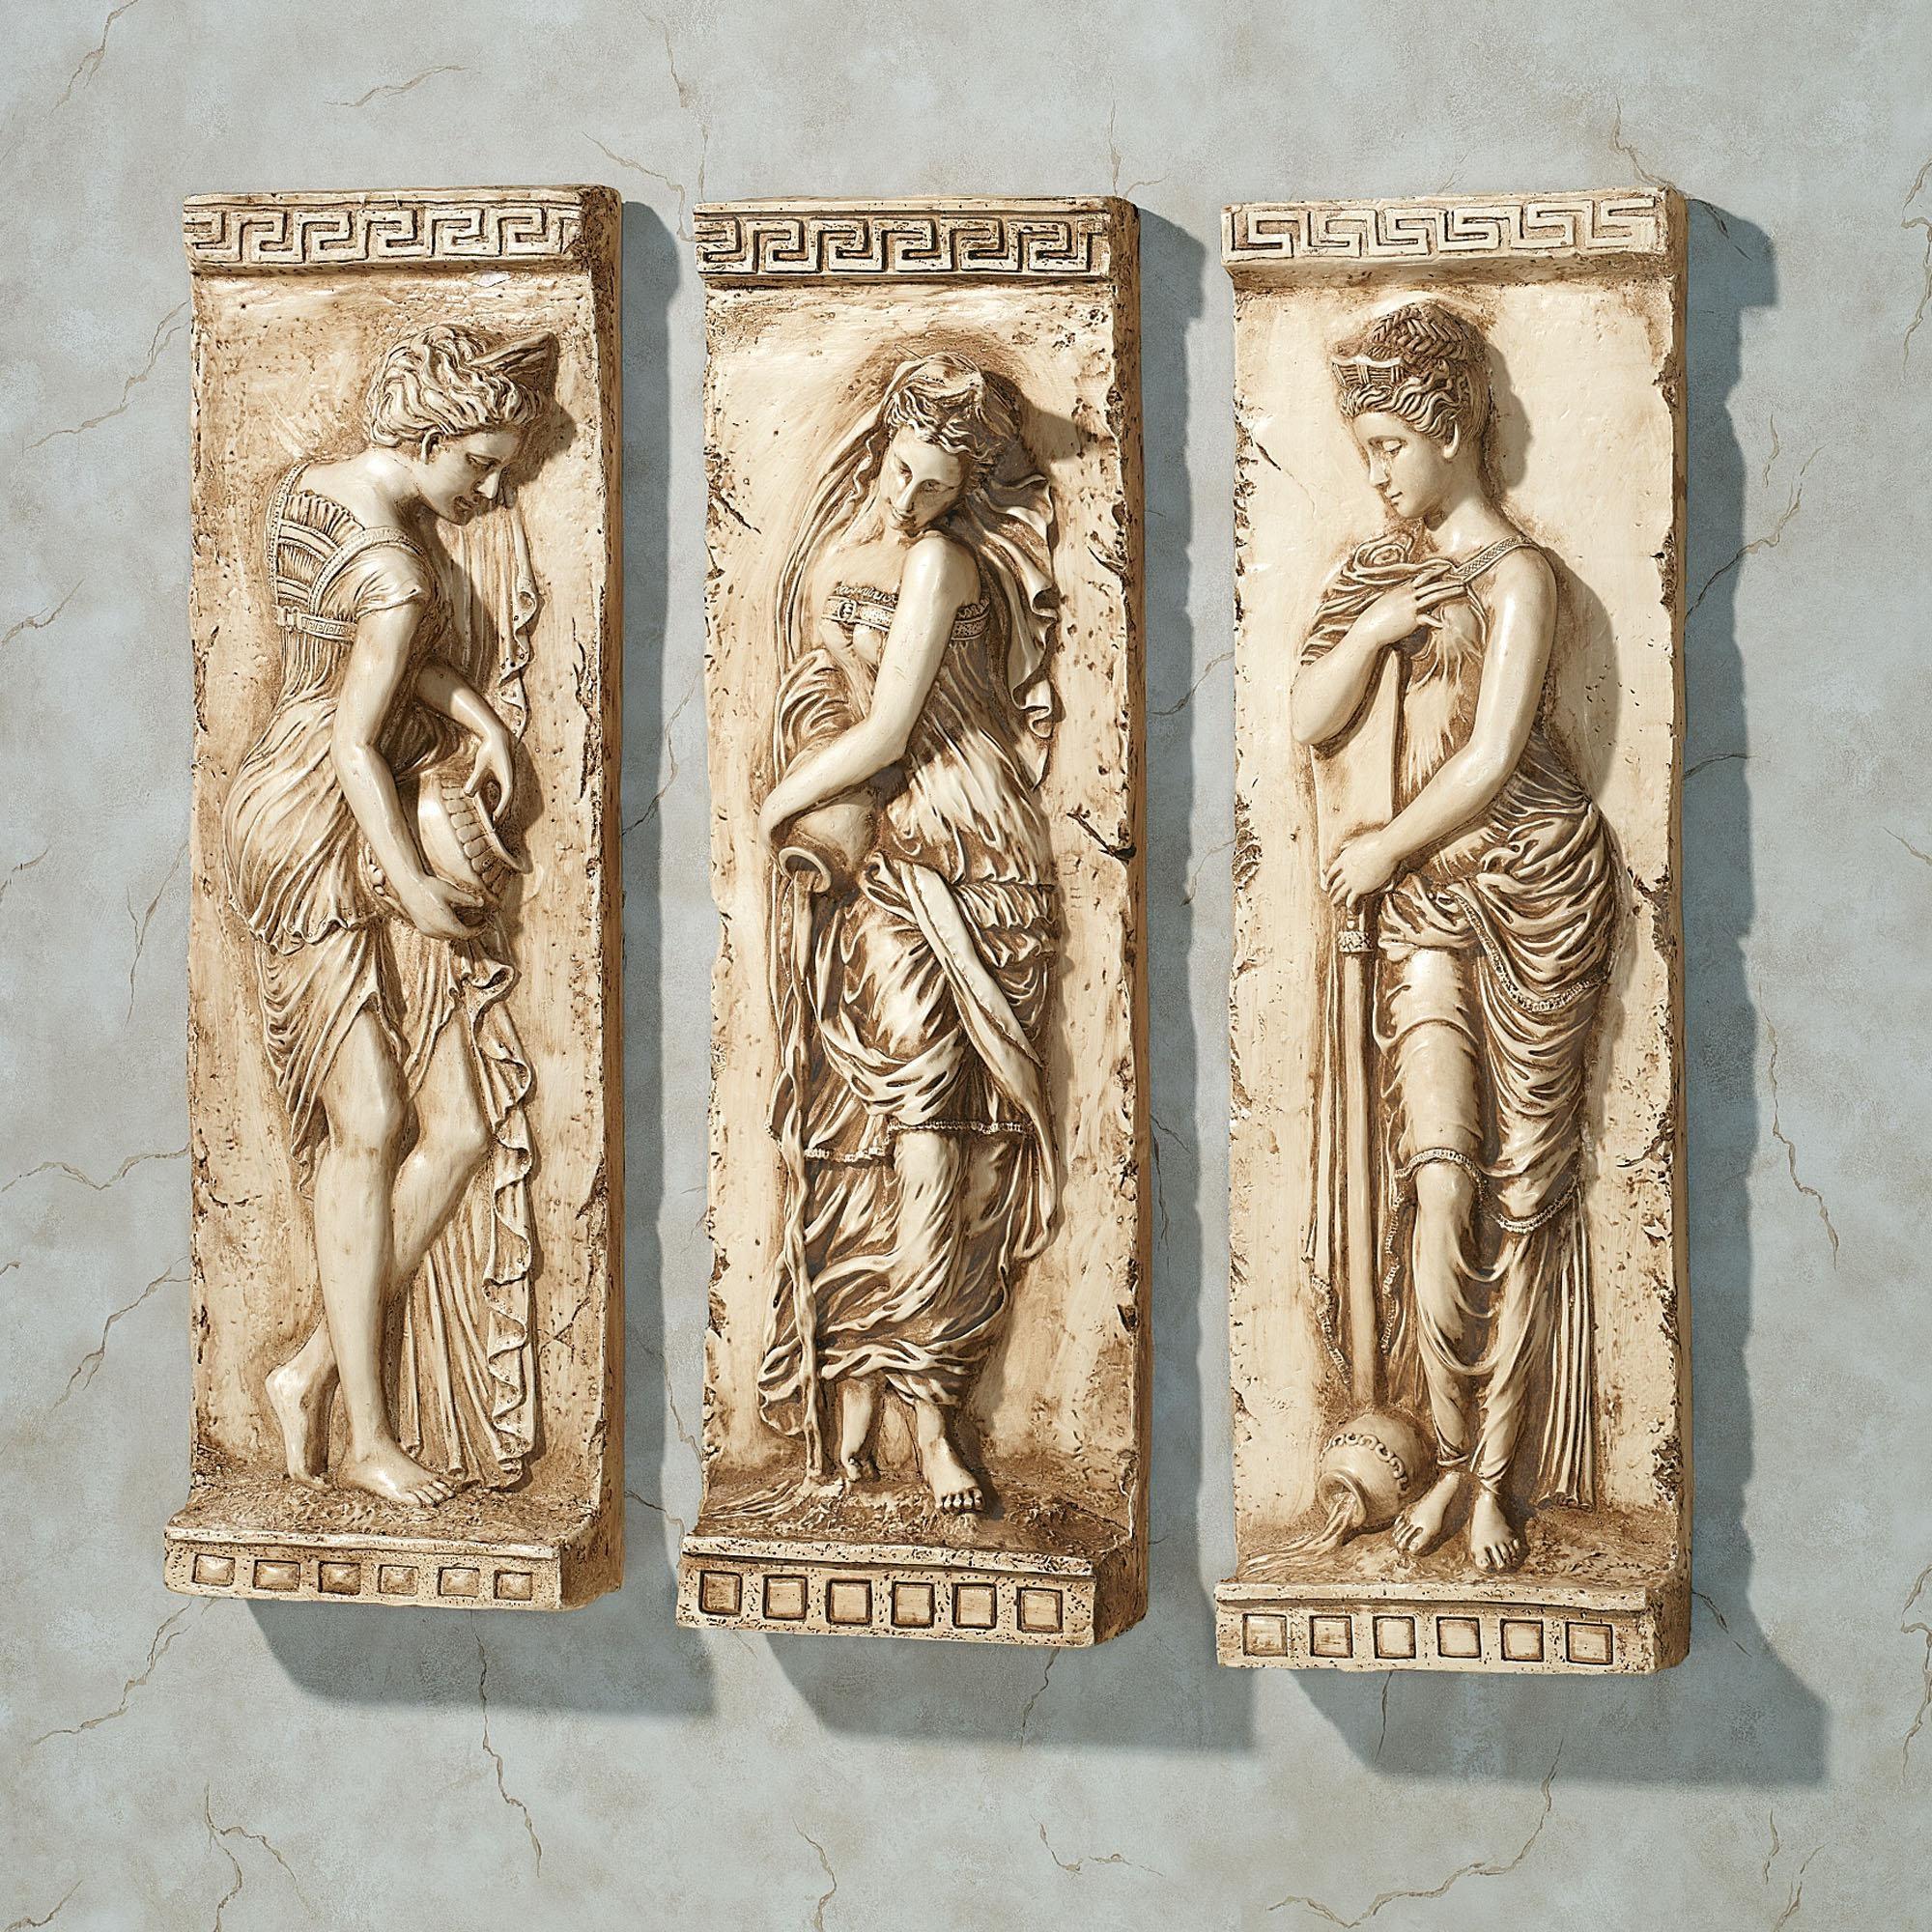 Wall Art Ideas Design : Reusable Metal Ancient Greek Wall Art Intended For Ancient Greek Wall Art (Image 18 of 20)